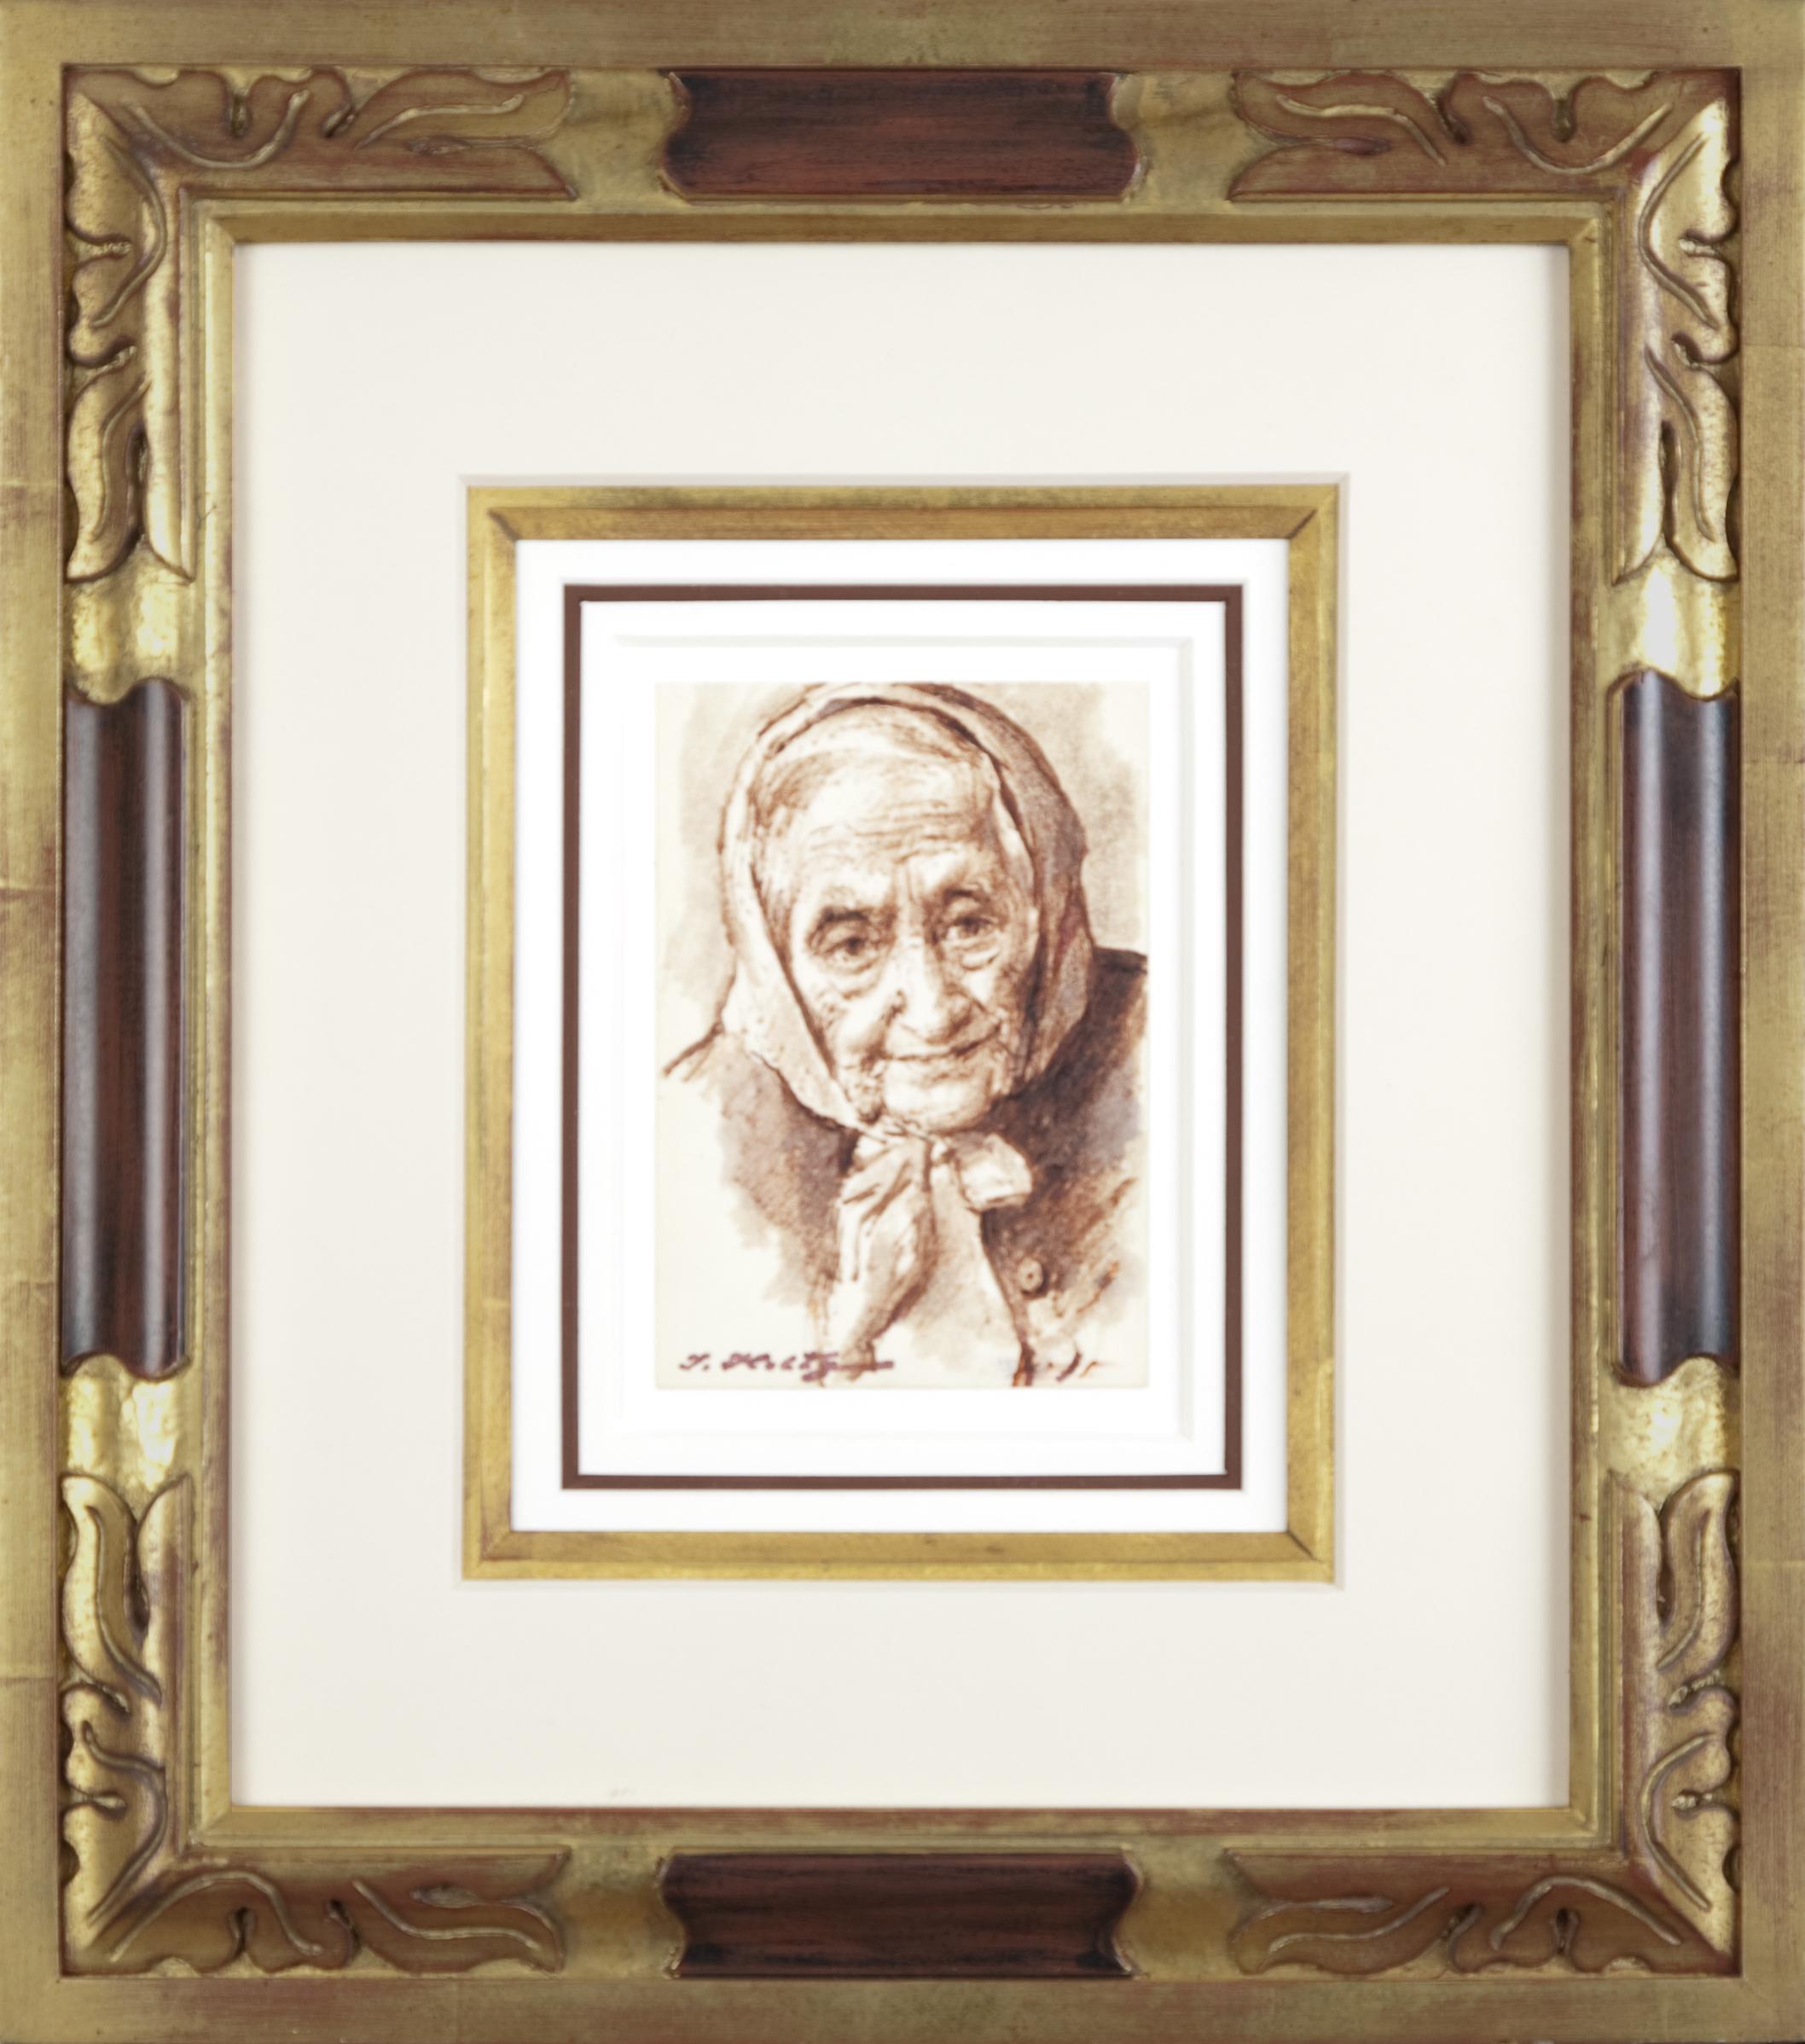 112 Aunt Sarah 1962 - Marker - 4 x 5.75 - Frame: 14.5 x 16.25 x 1.25